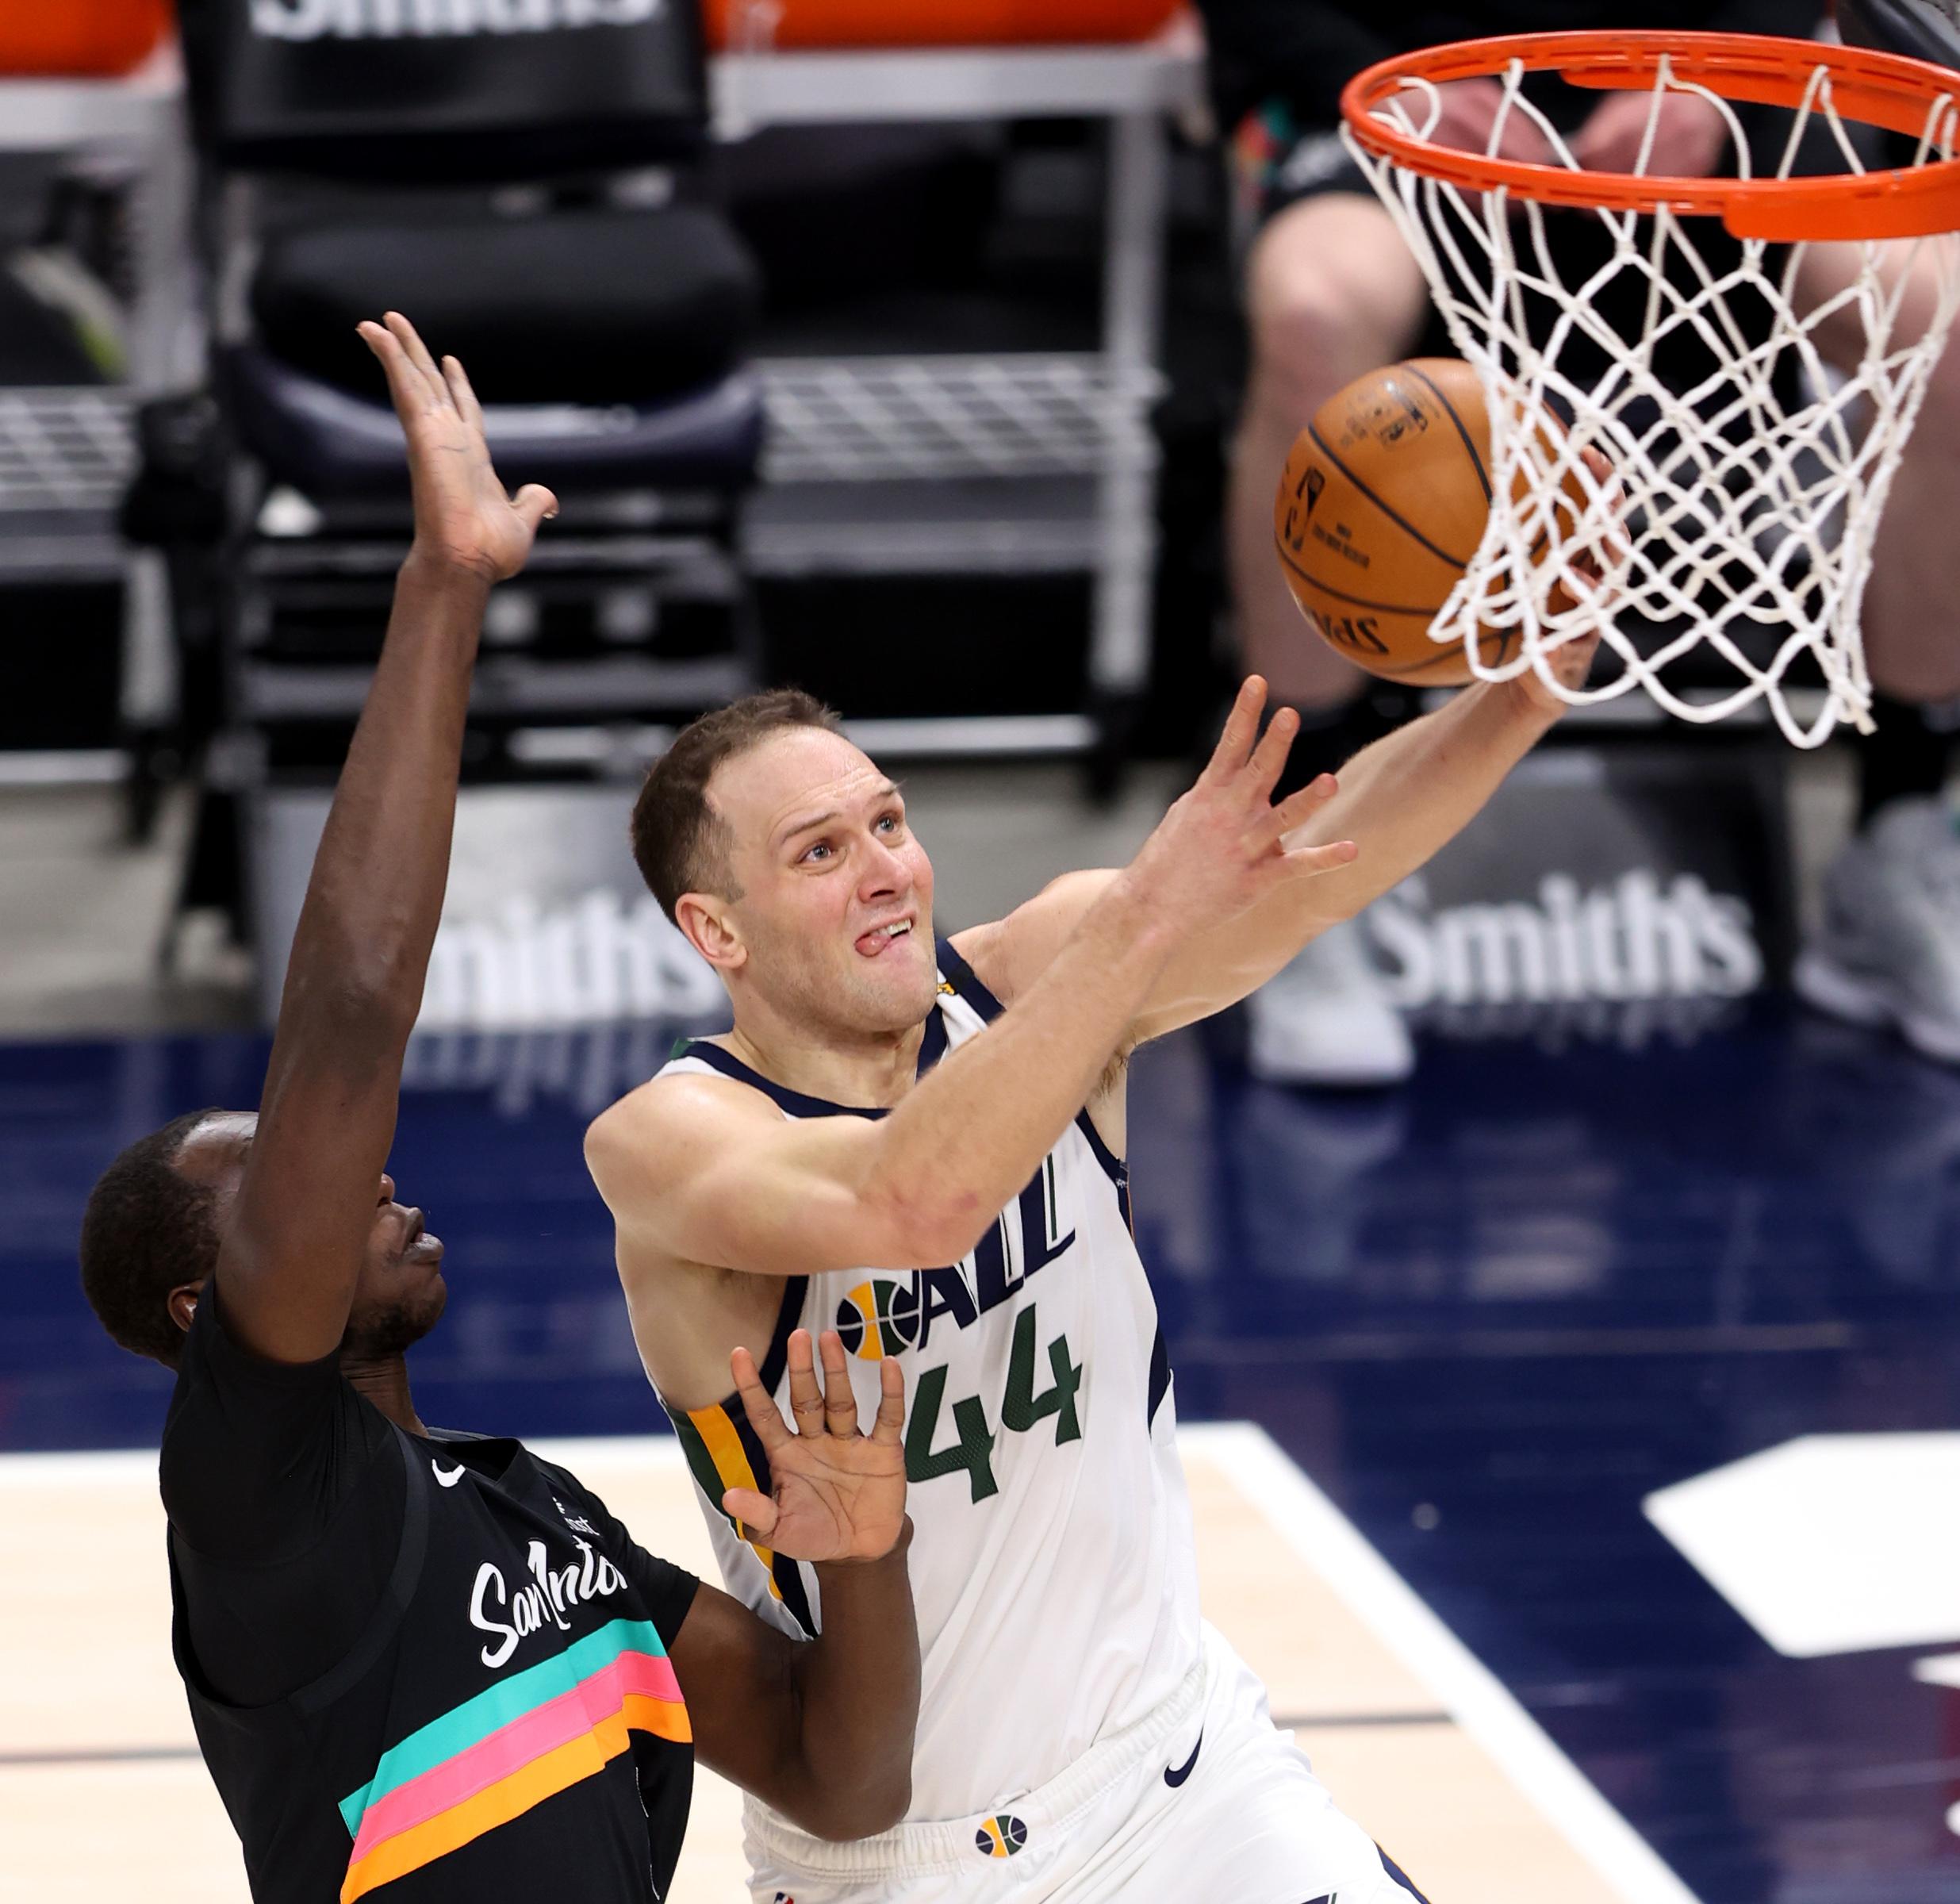 Utah Jazz forward Bojan Bogdanovic (44) puts in a shot with San Antonio Spurs center Gorgui Dieng (7) defending as the Utah Jazz and the San Antonio Spurs play an NBA basketball game at Vivint Arena in Salt Lake City on Wednesday, May 5, 2021.